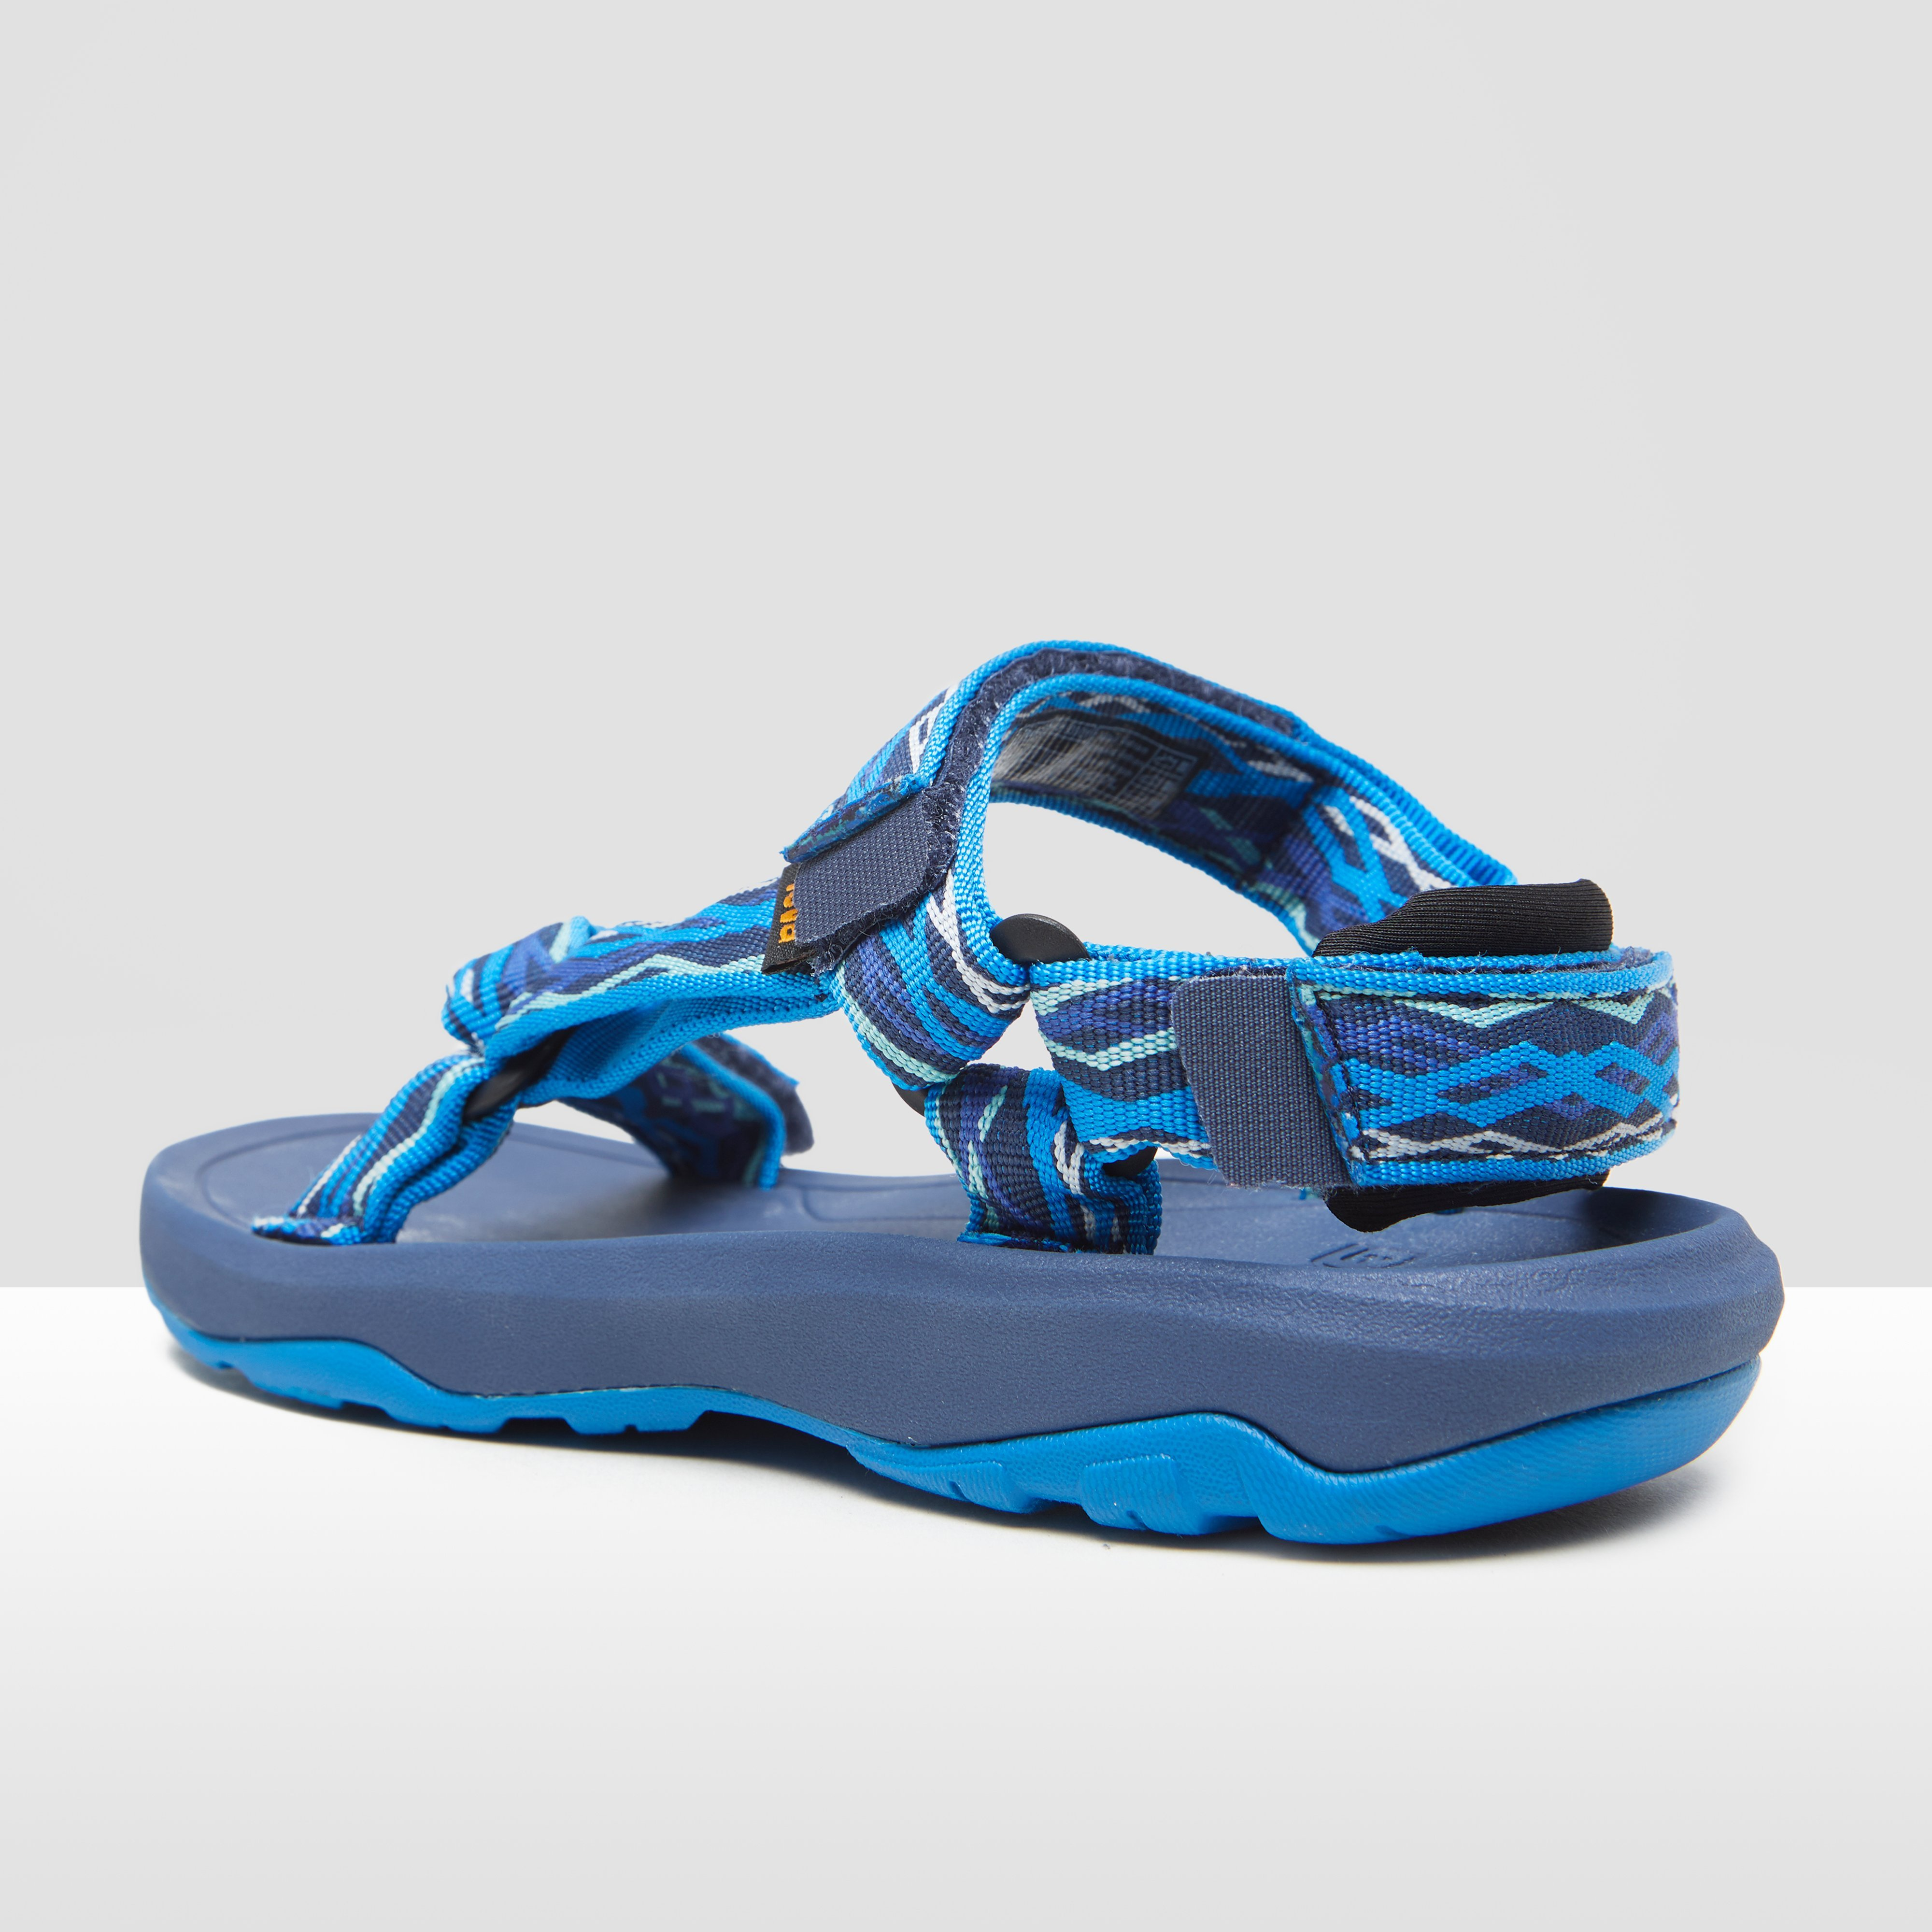 Teva Ouragan T 2 Sandales Xl - Enfants - Bleu p0kOcJ